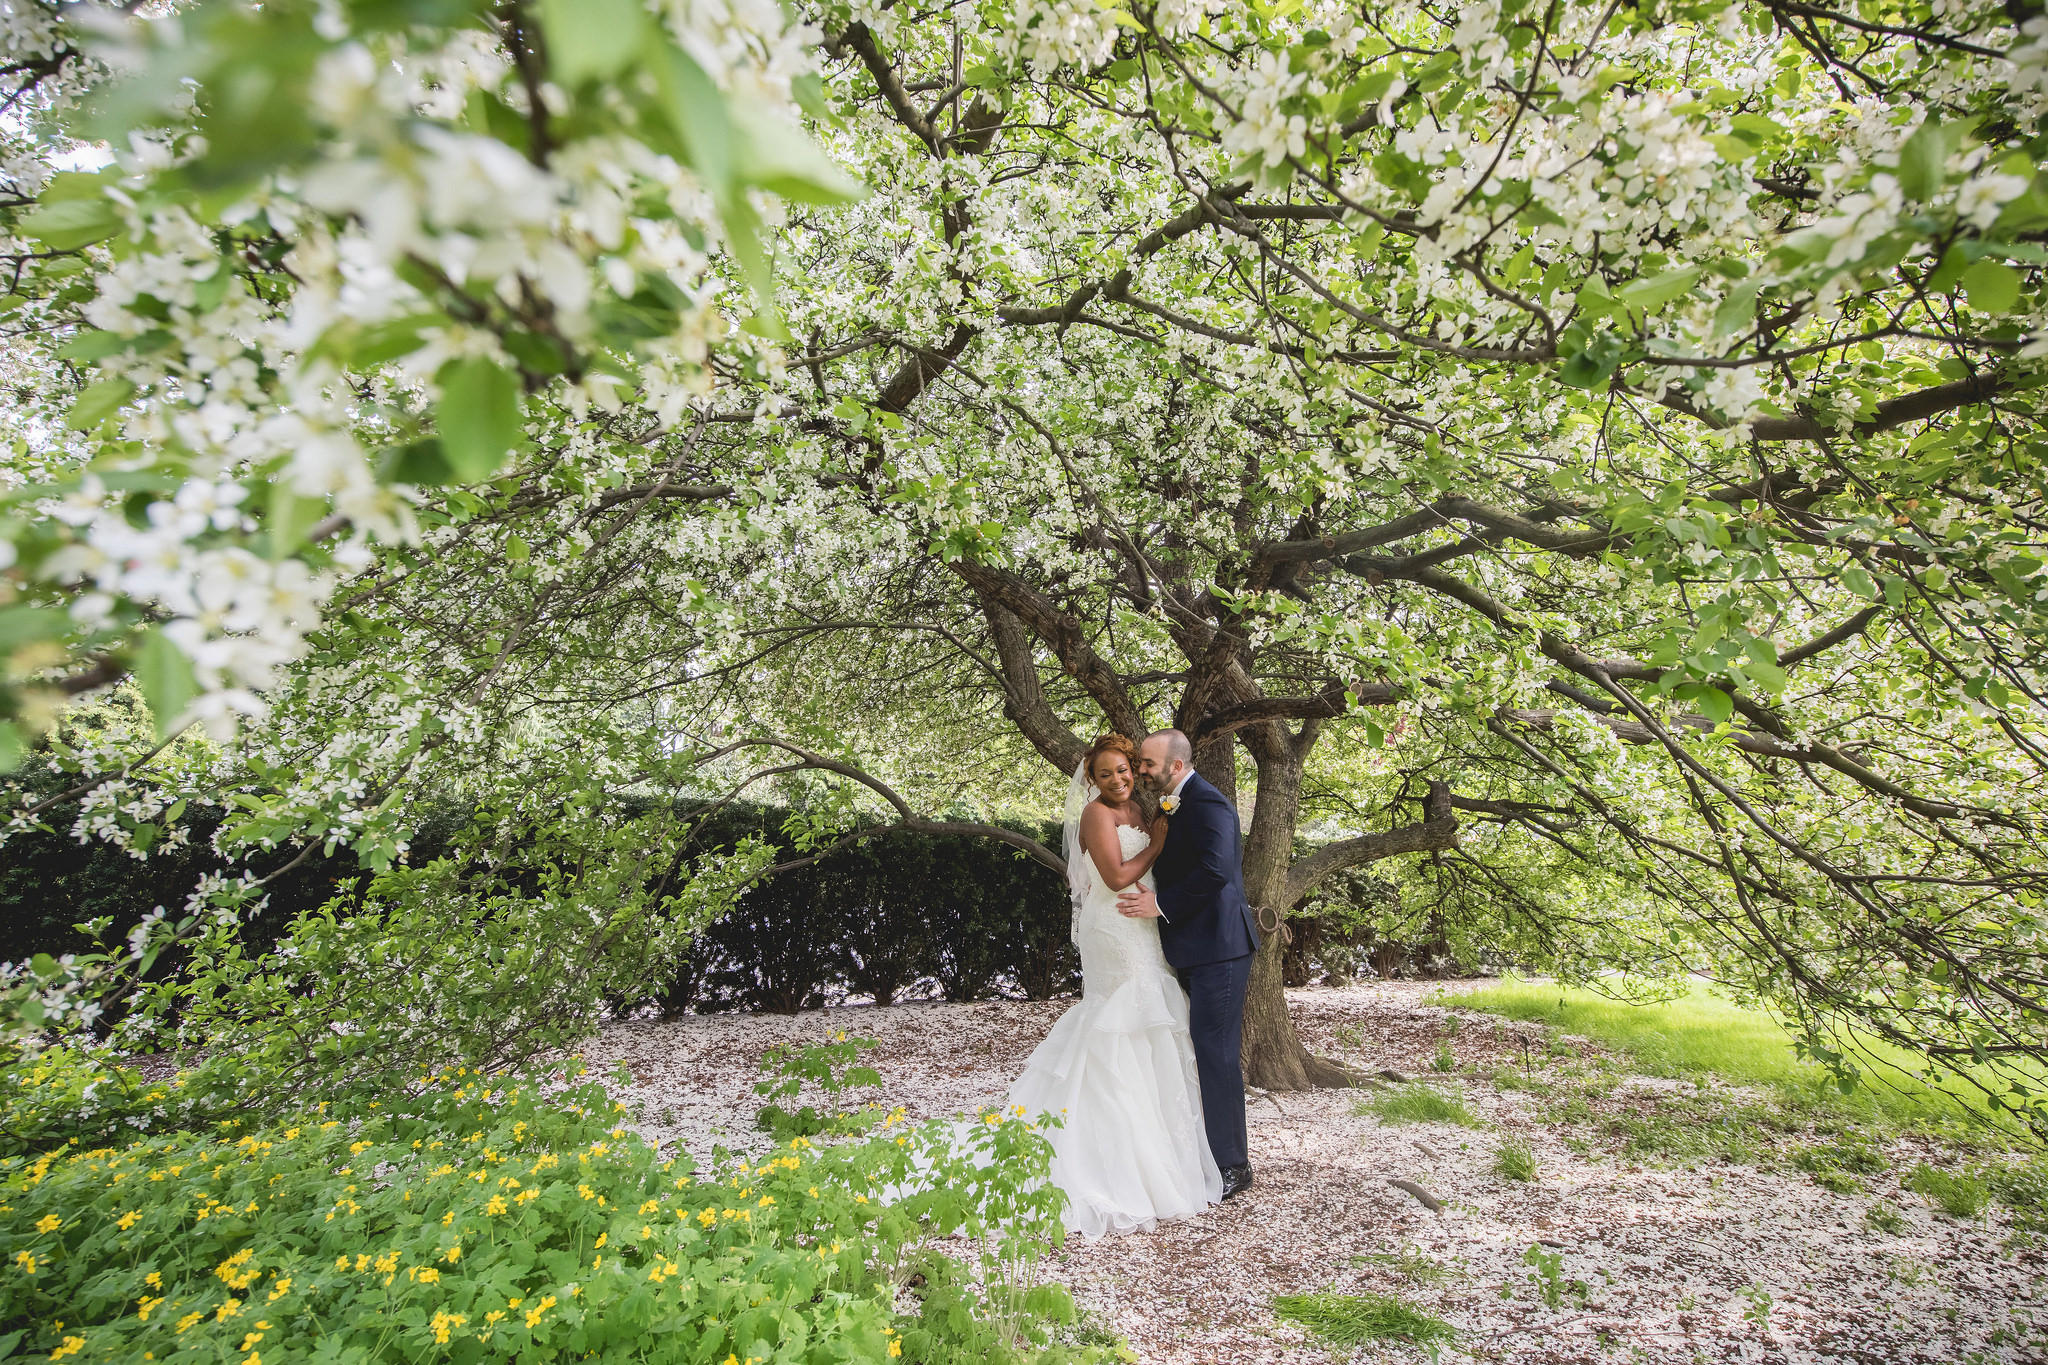 The perfect cherry blossom backdrop! Photo by Heartfelt Studios.